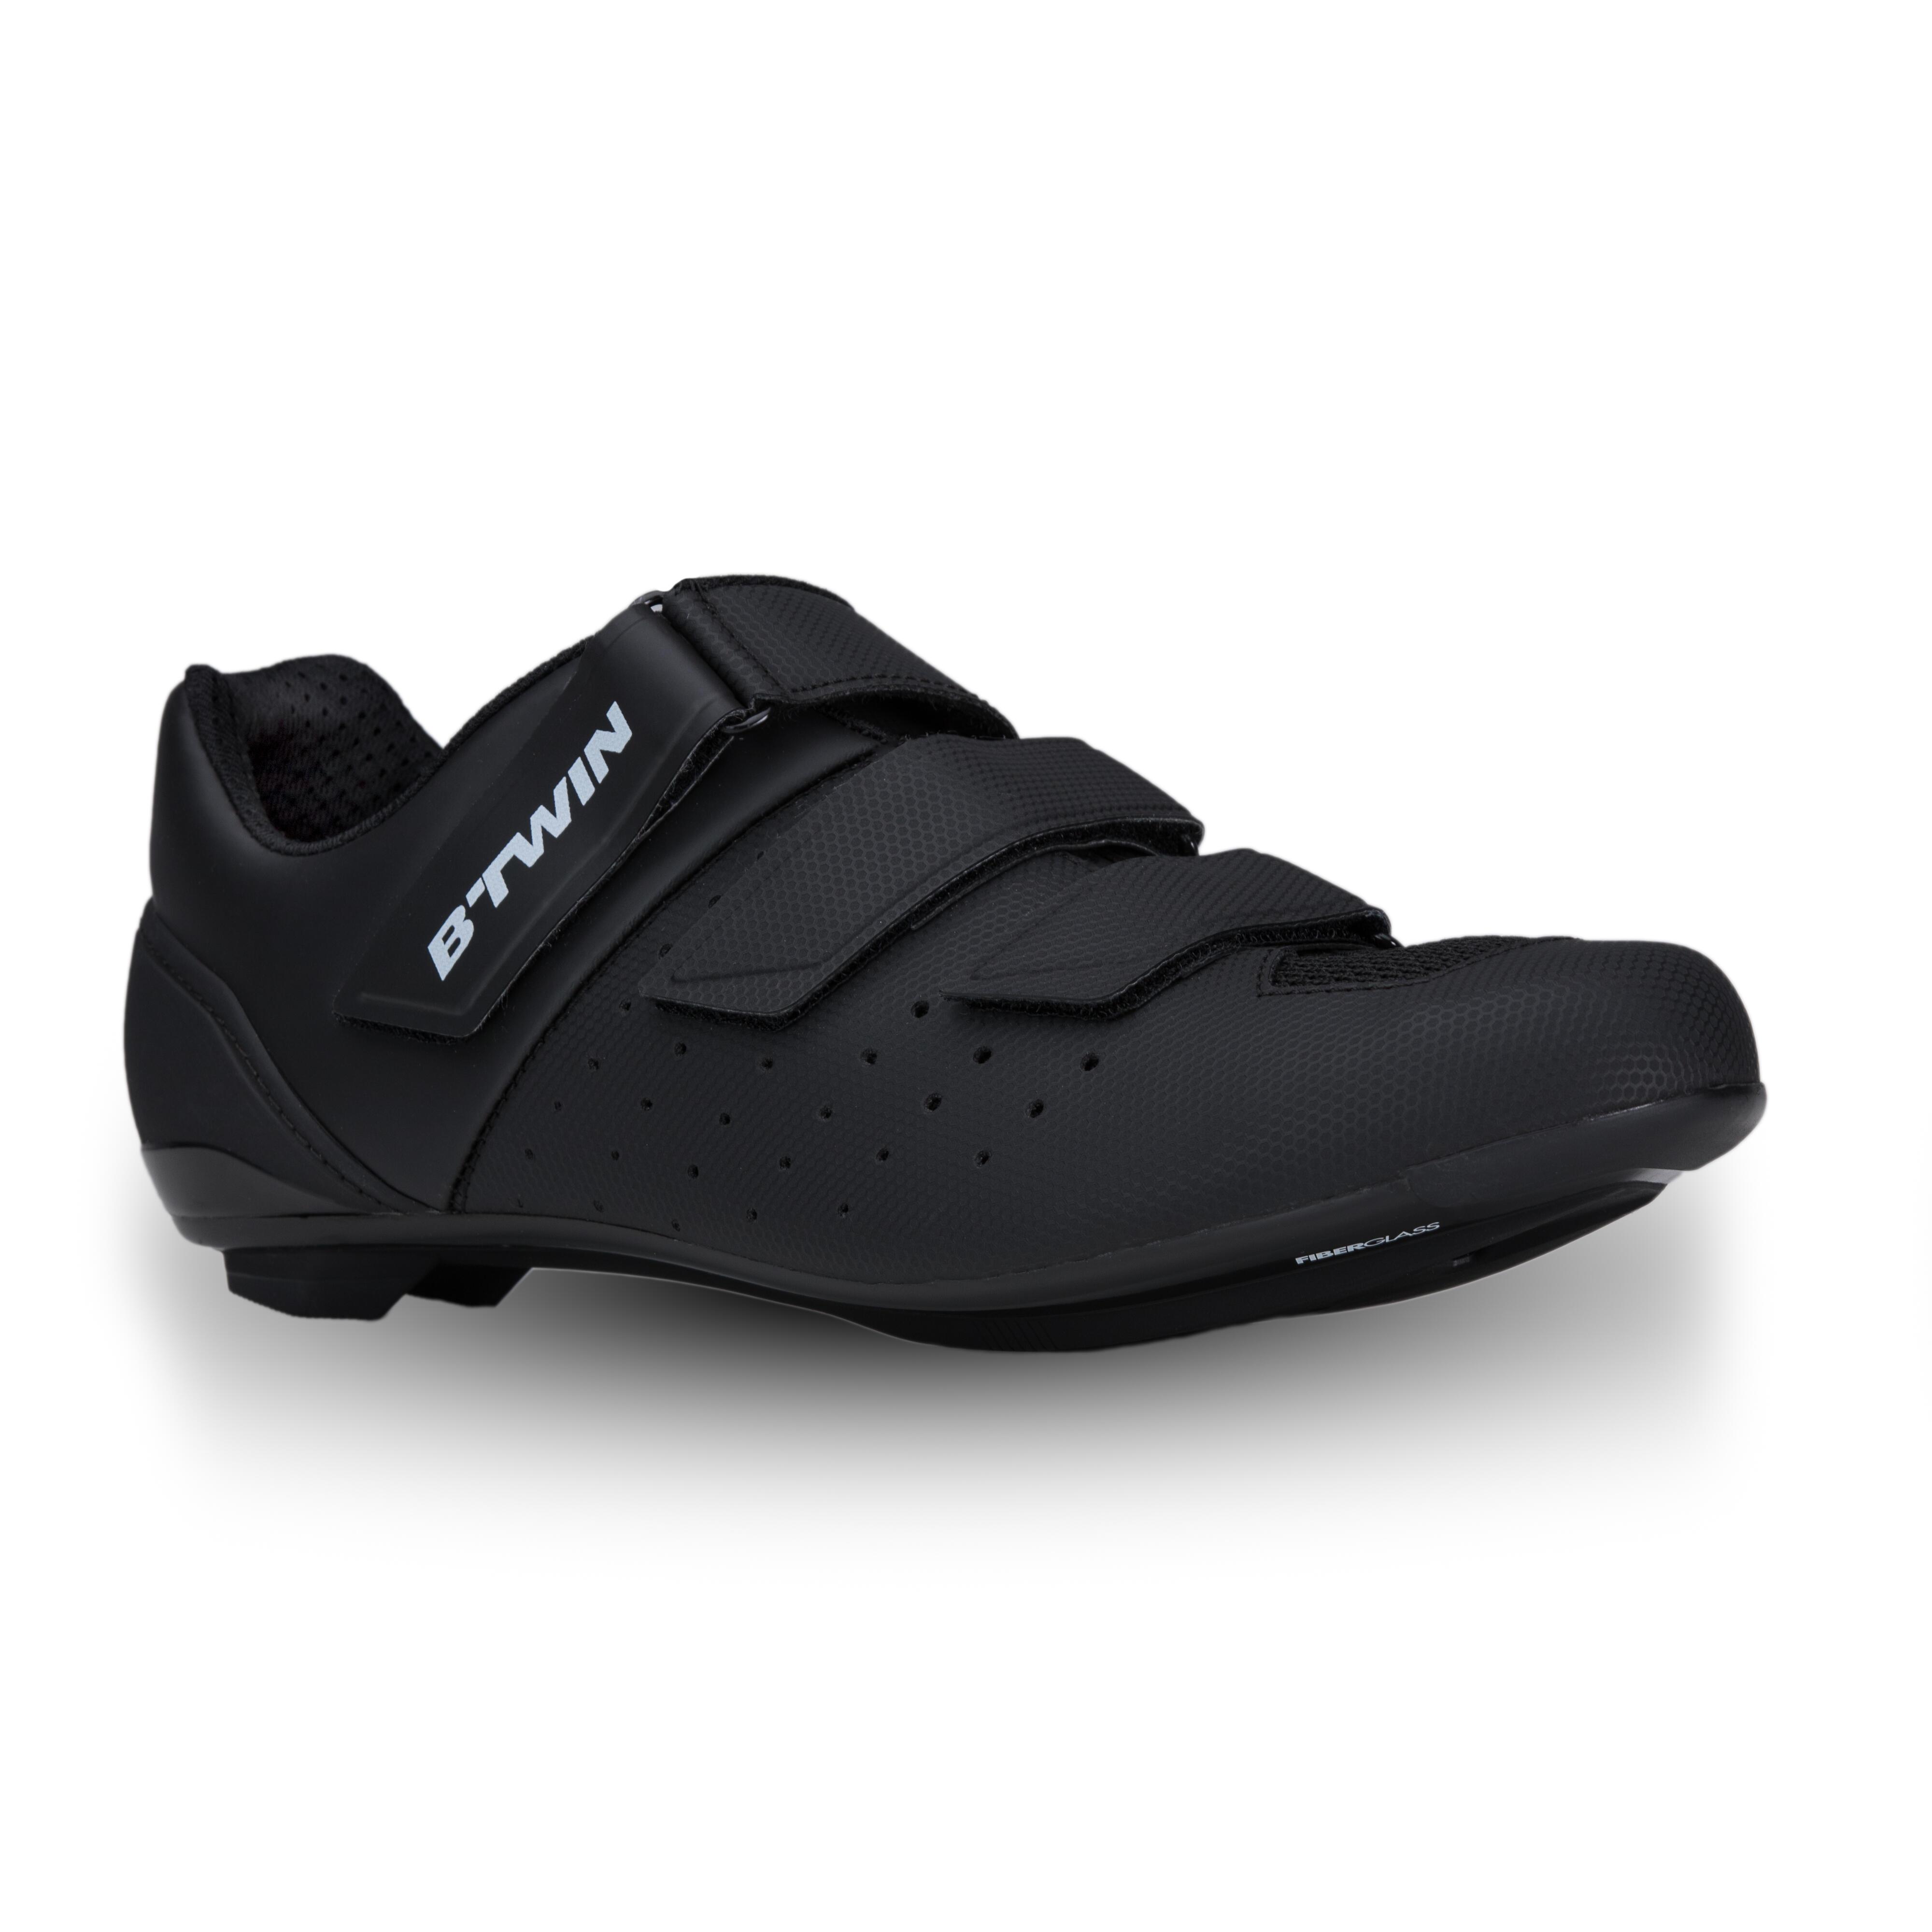 Zapatos de ciclismo ROADR 500 NEGRO